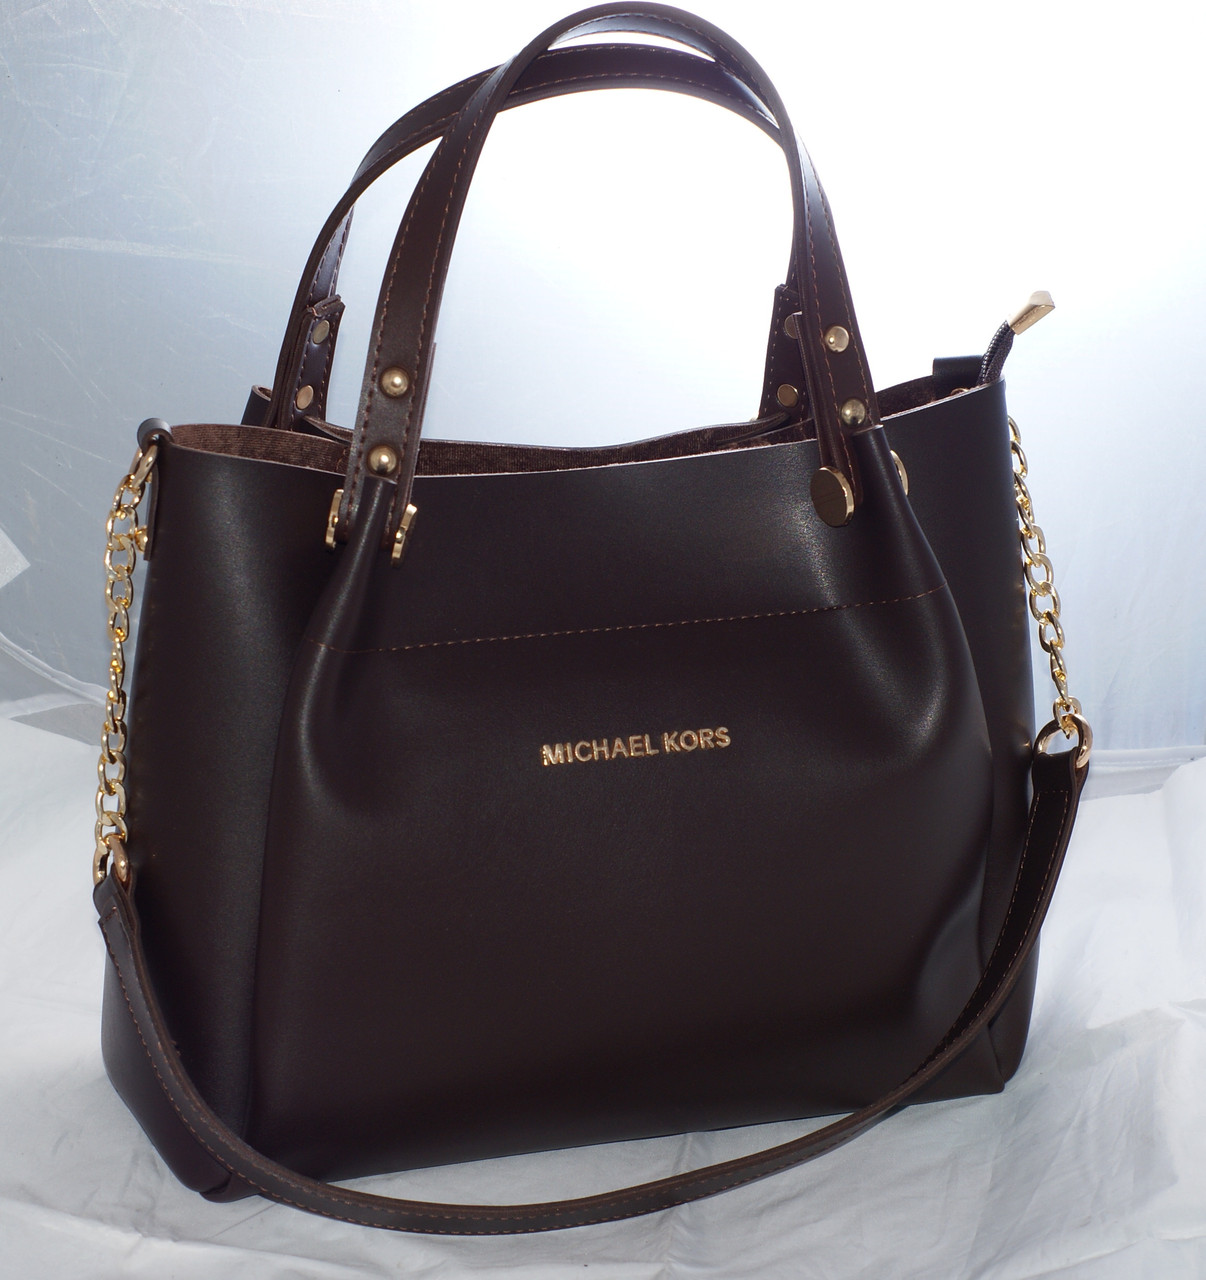 b827f9542b10 Женская сумка Michael Kors (Майкл Корс), коричневая  продажа, цена в ...